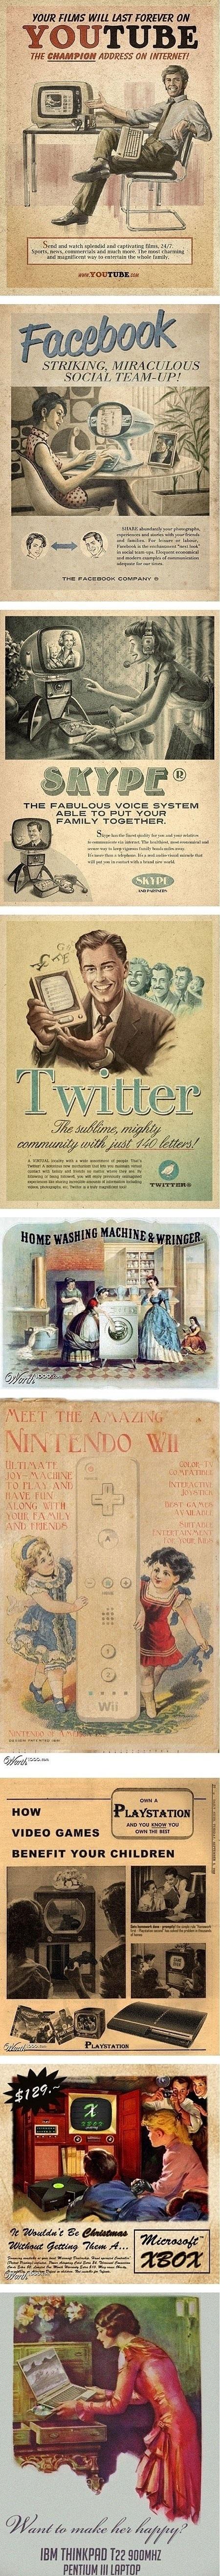 Old School Advertisements